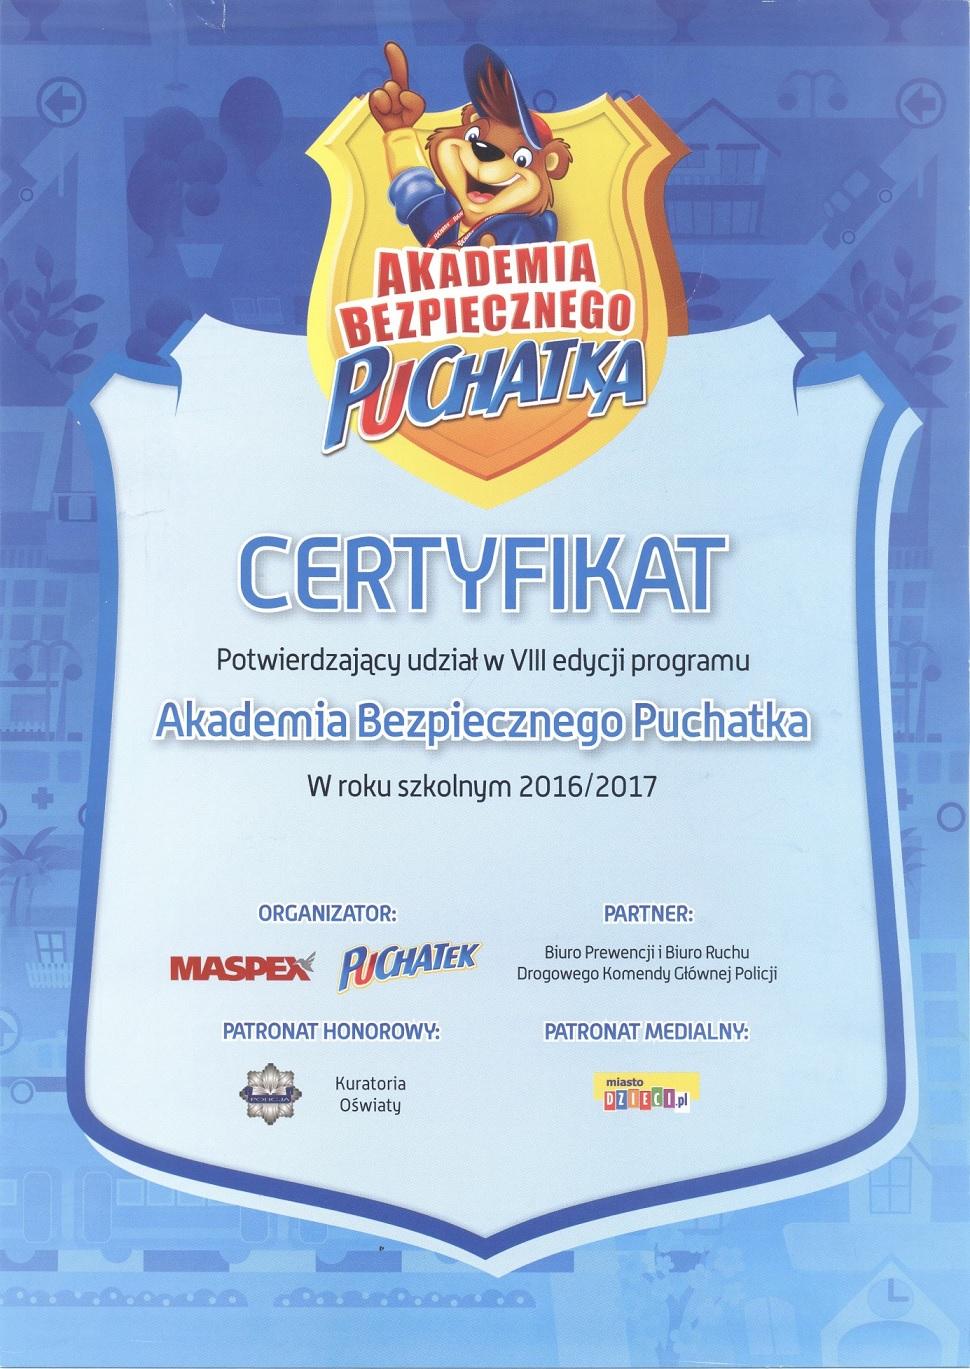 http://sp64krakow.pl/wp-content/uploads/2016/11/certyfikat-puchatek.jpg